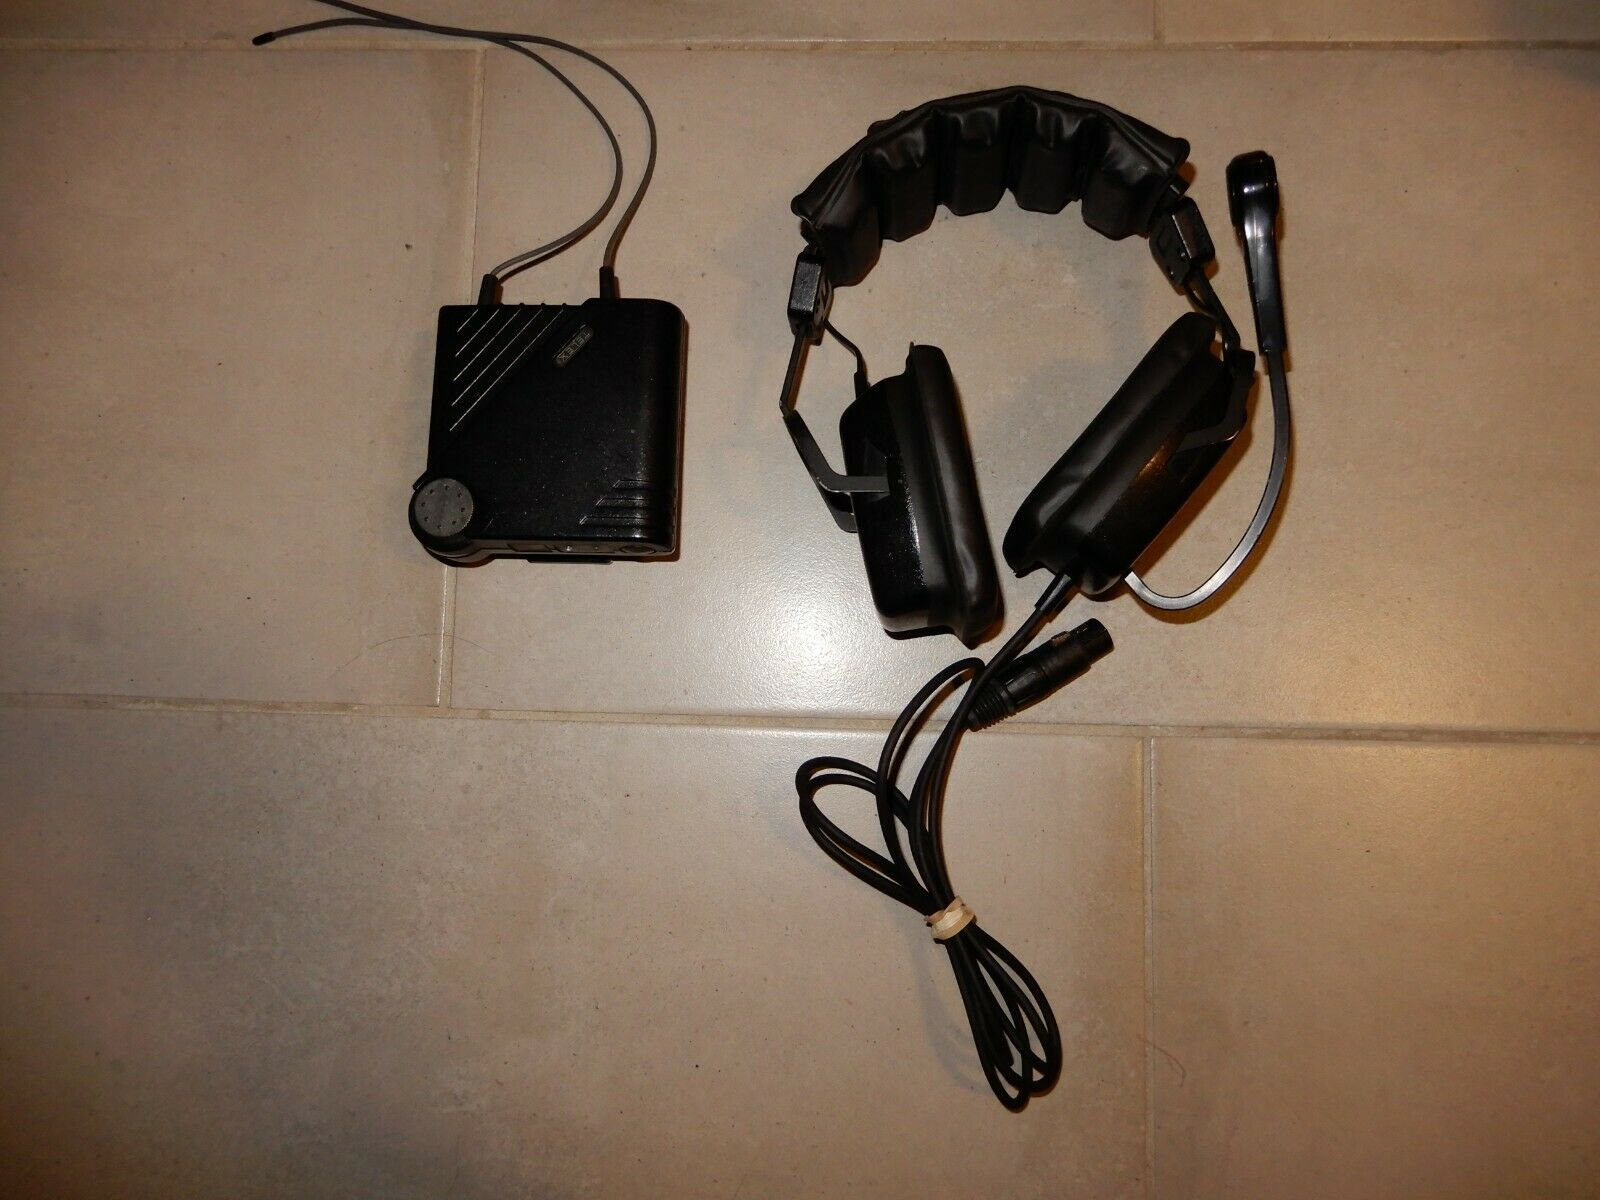 TELEX 64437 PH-2 Headset with 70681 Wireless Mic Transmitter T206 Beltpack